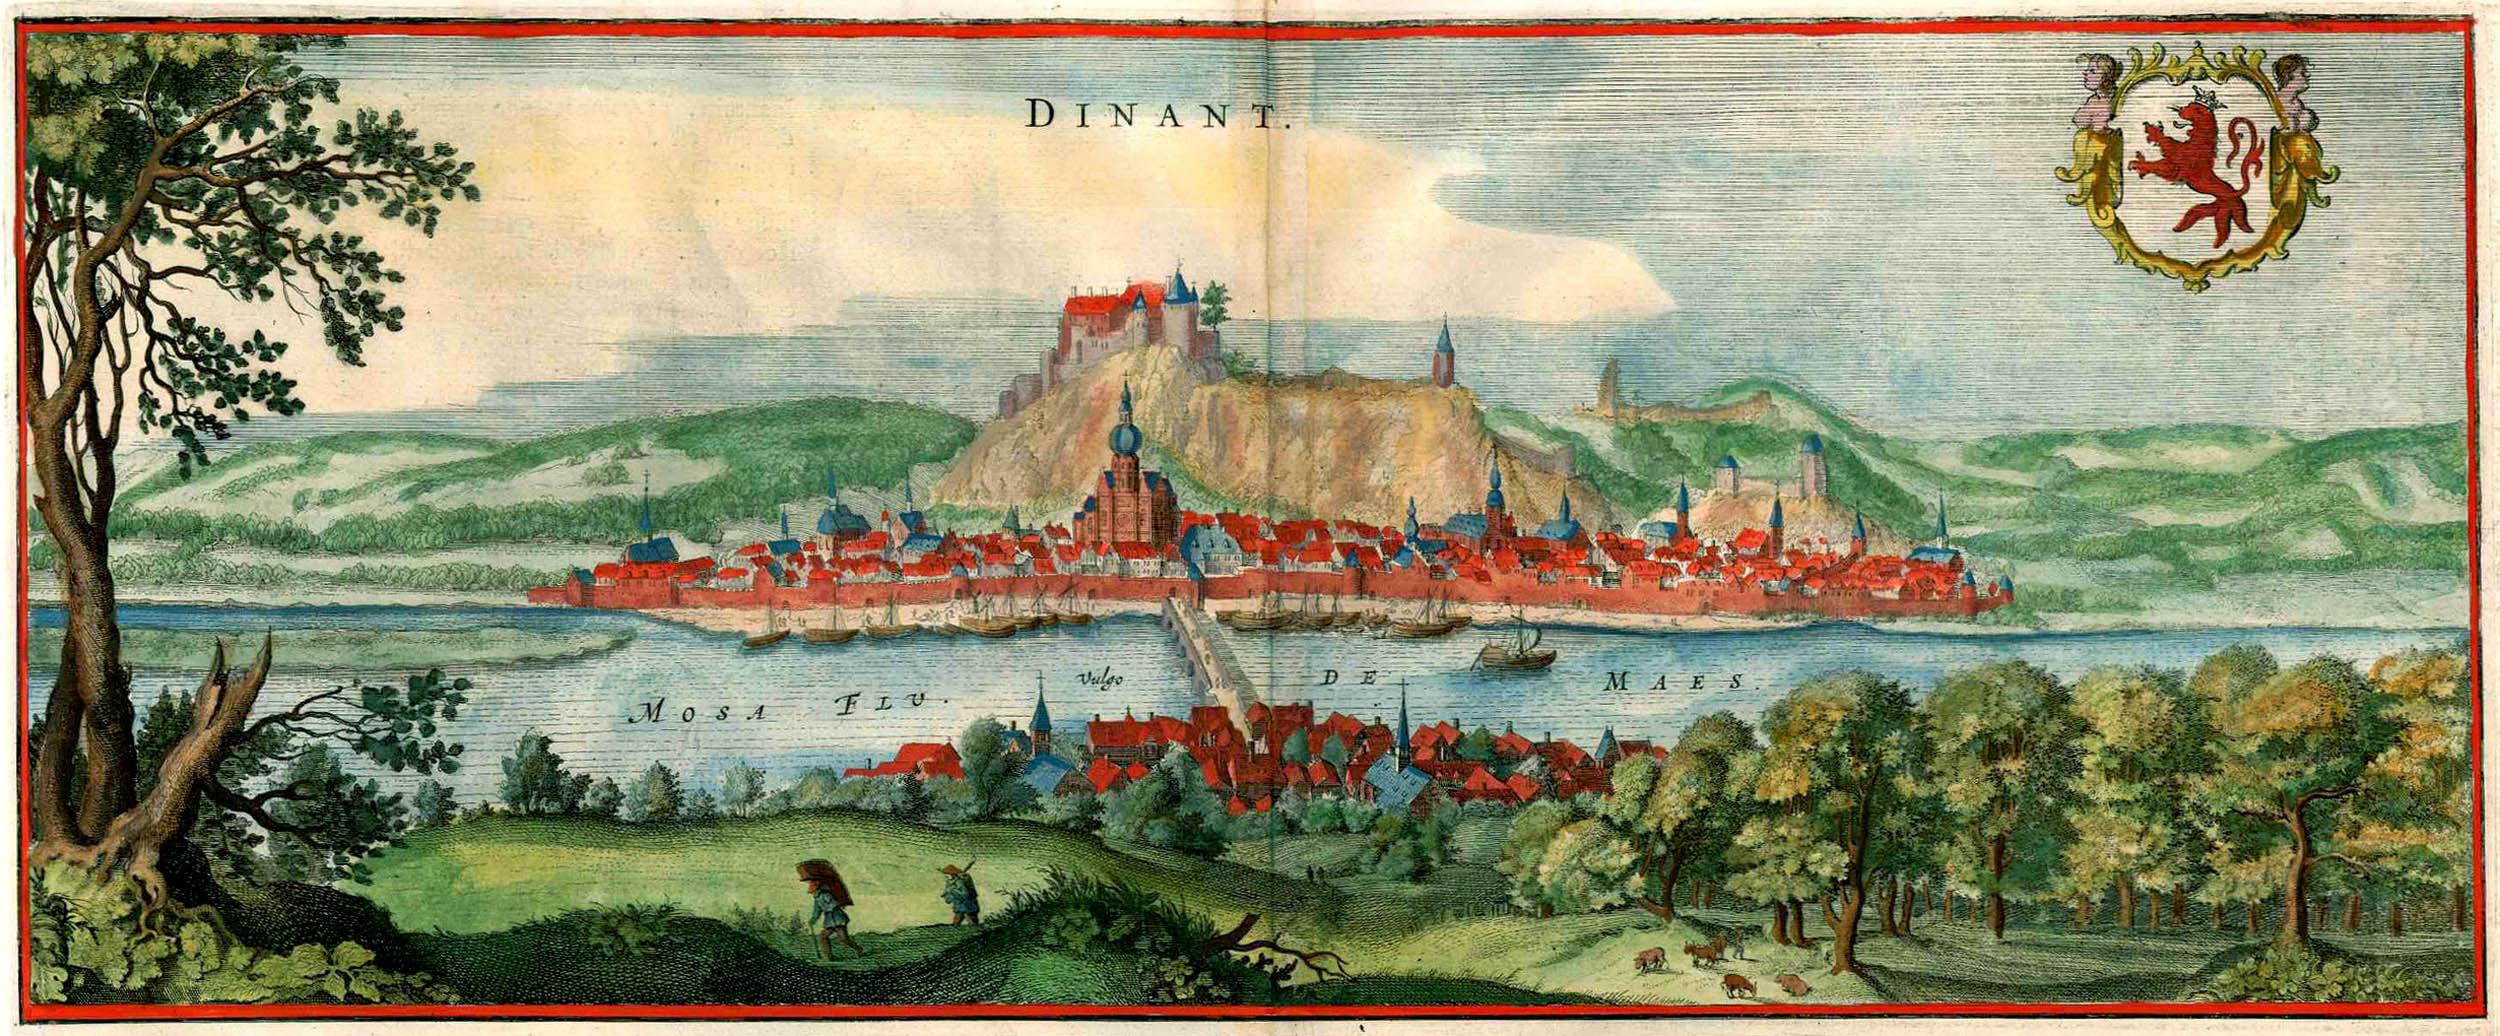 1649-MilheuserBlaeu.jpg